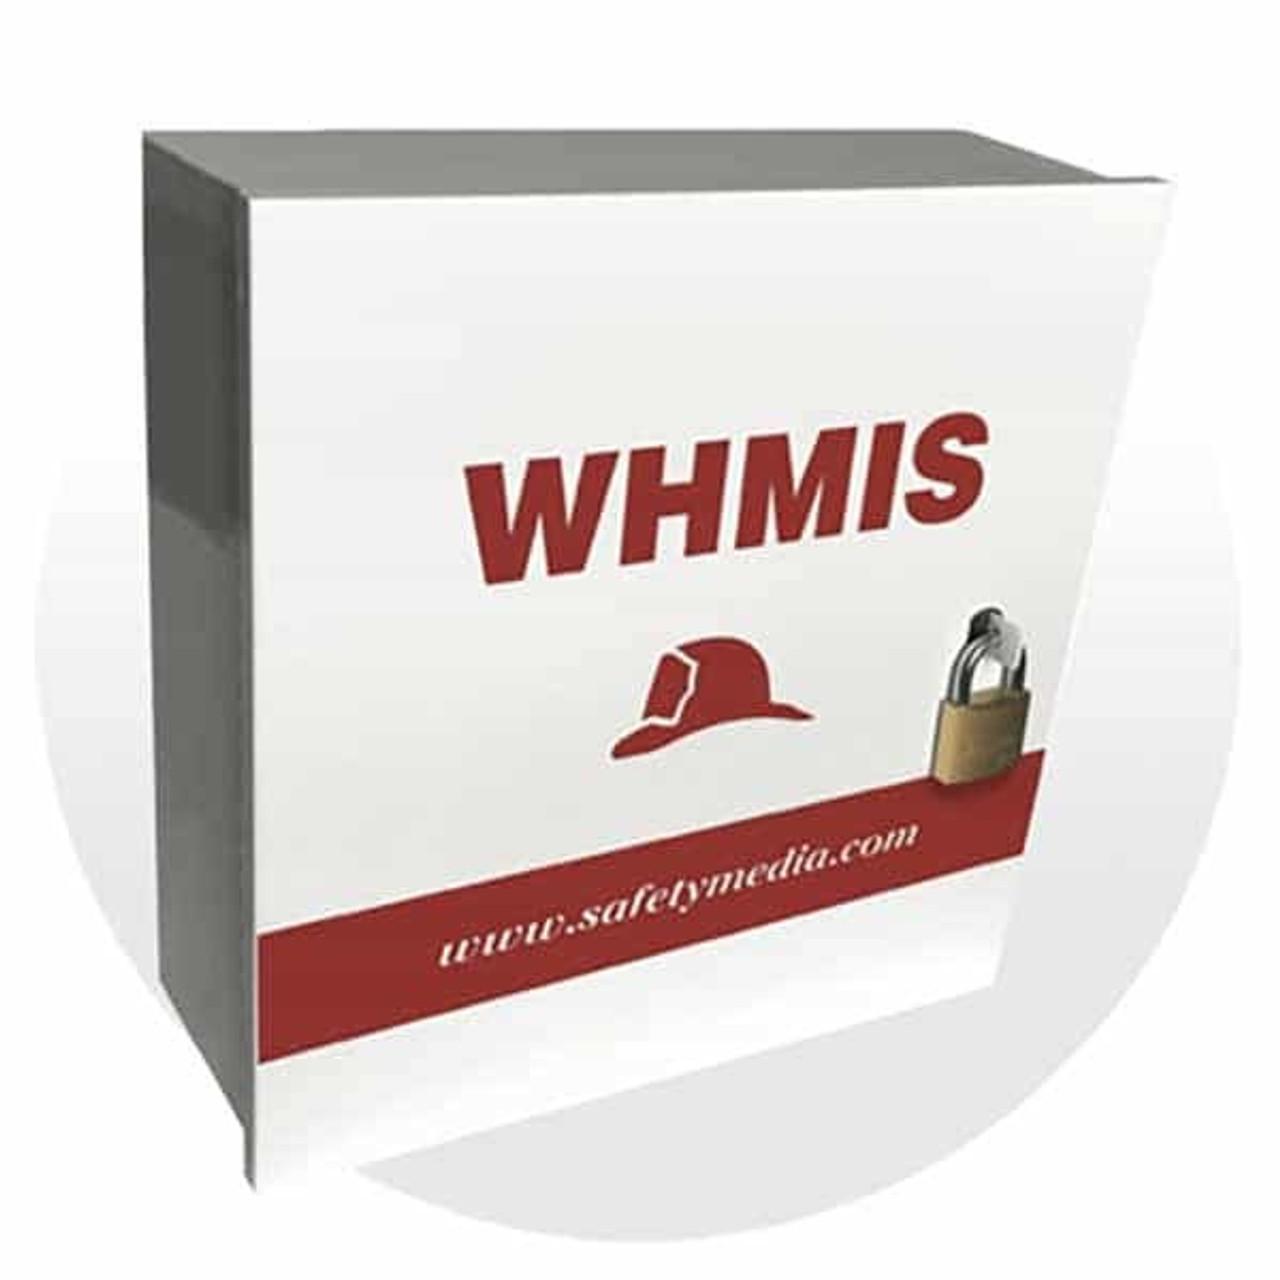 WHMIS Boxes & Accessories